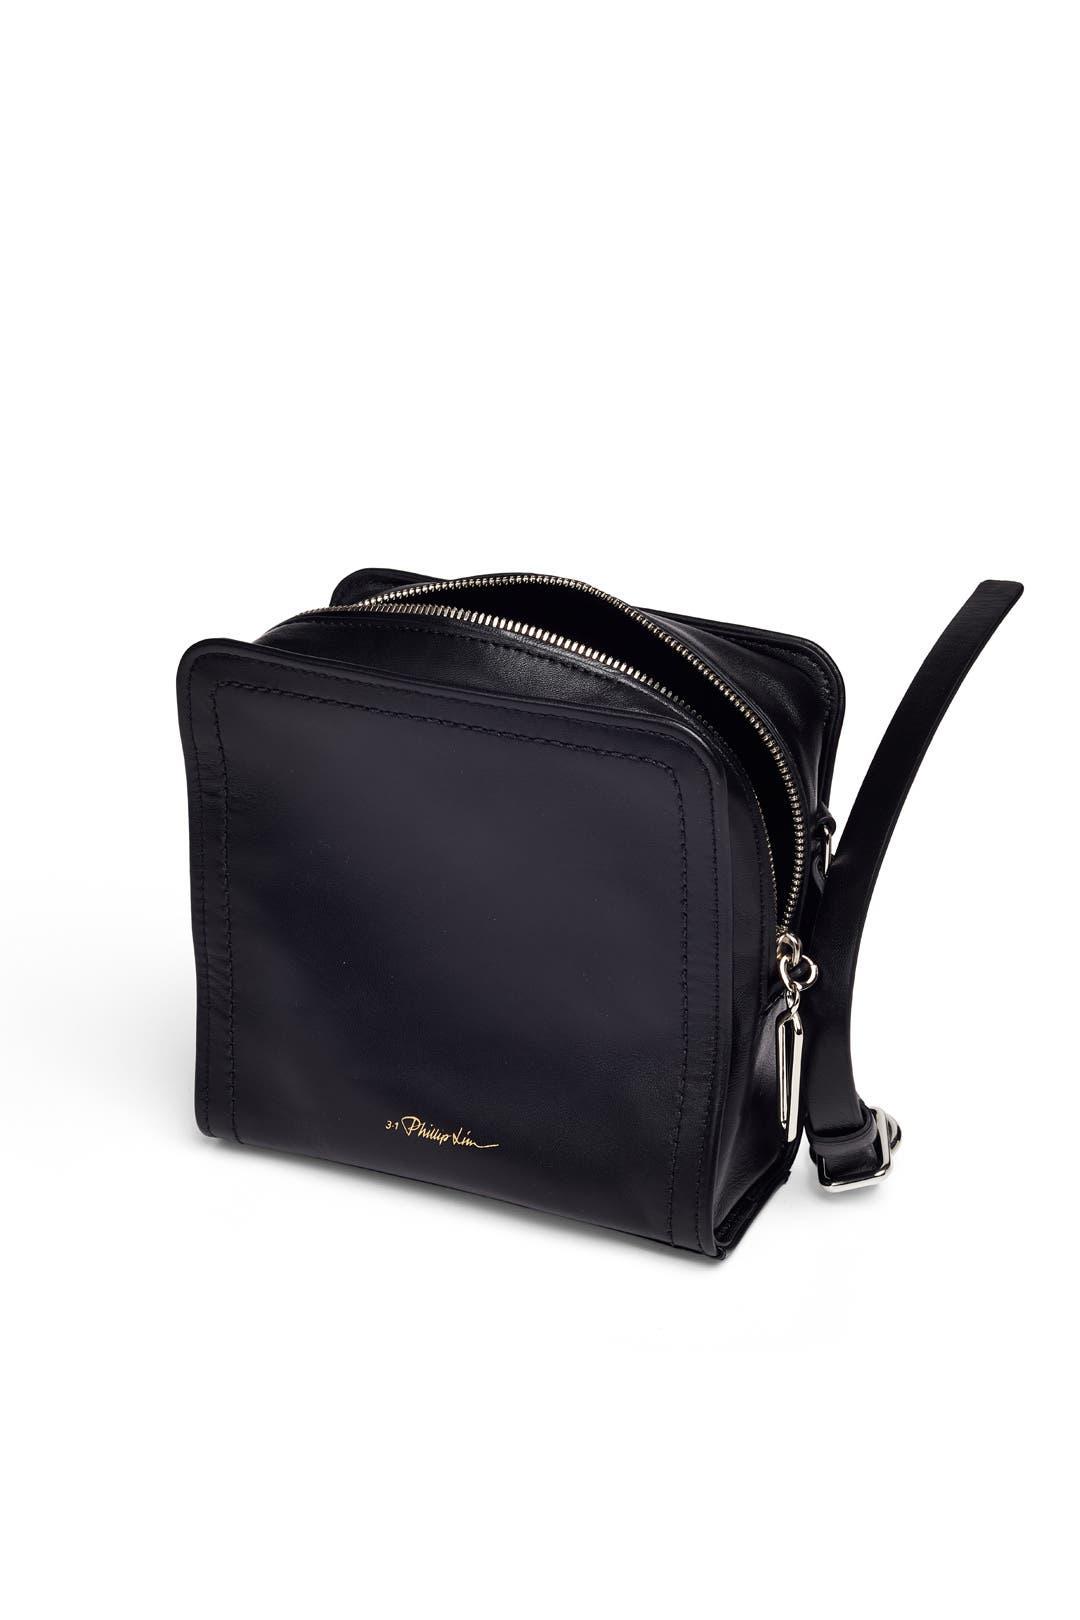 8a1e3ab582d8 Hudson Mini Square Bag by 3.1 Phillip Lim Accessories for  75